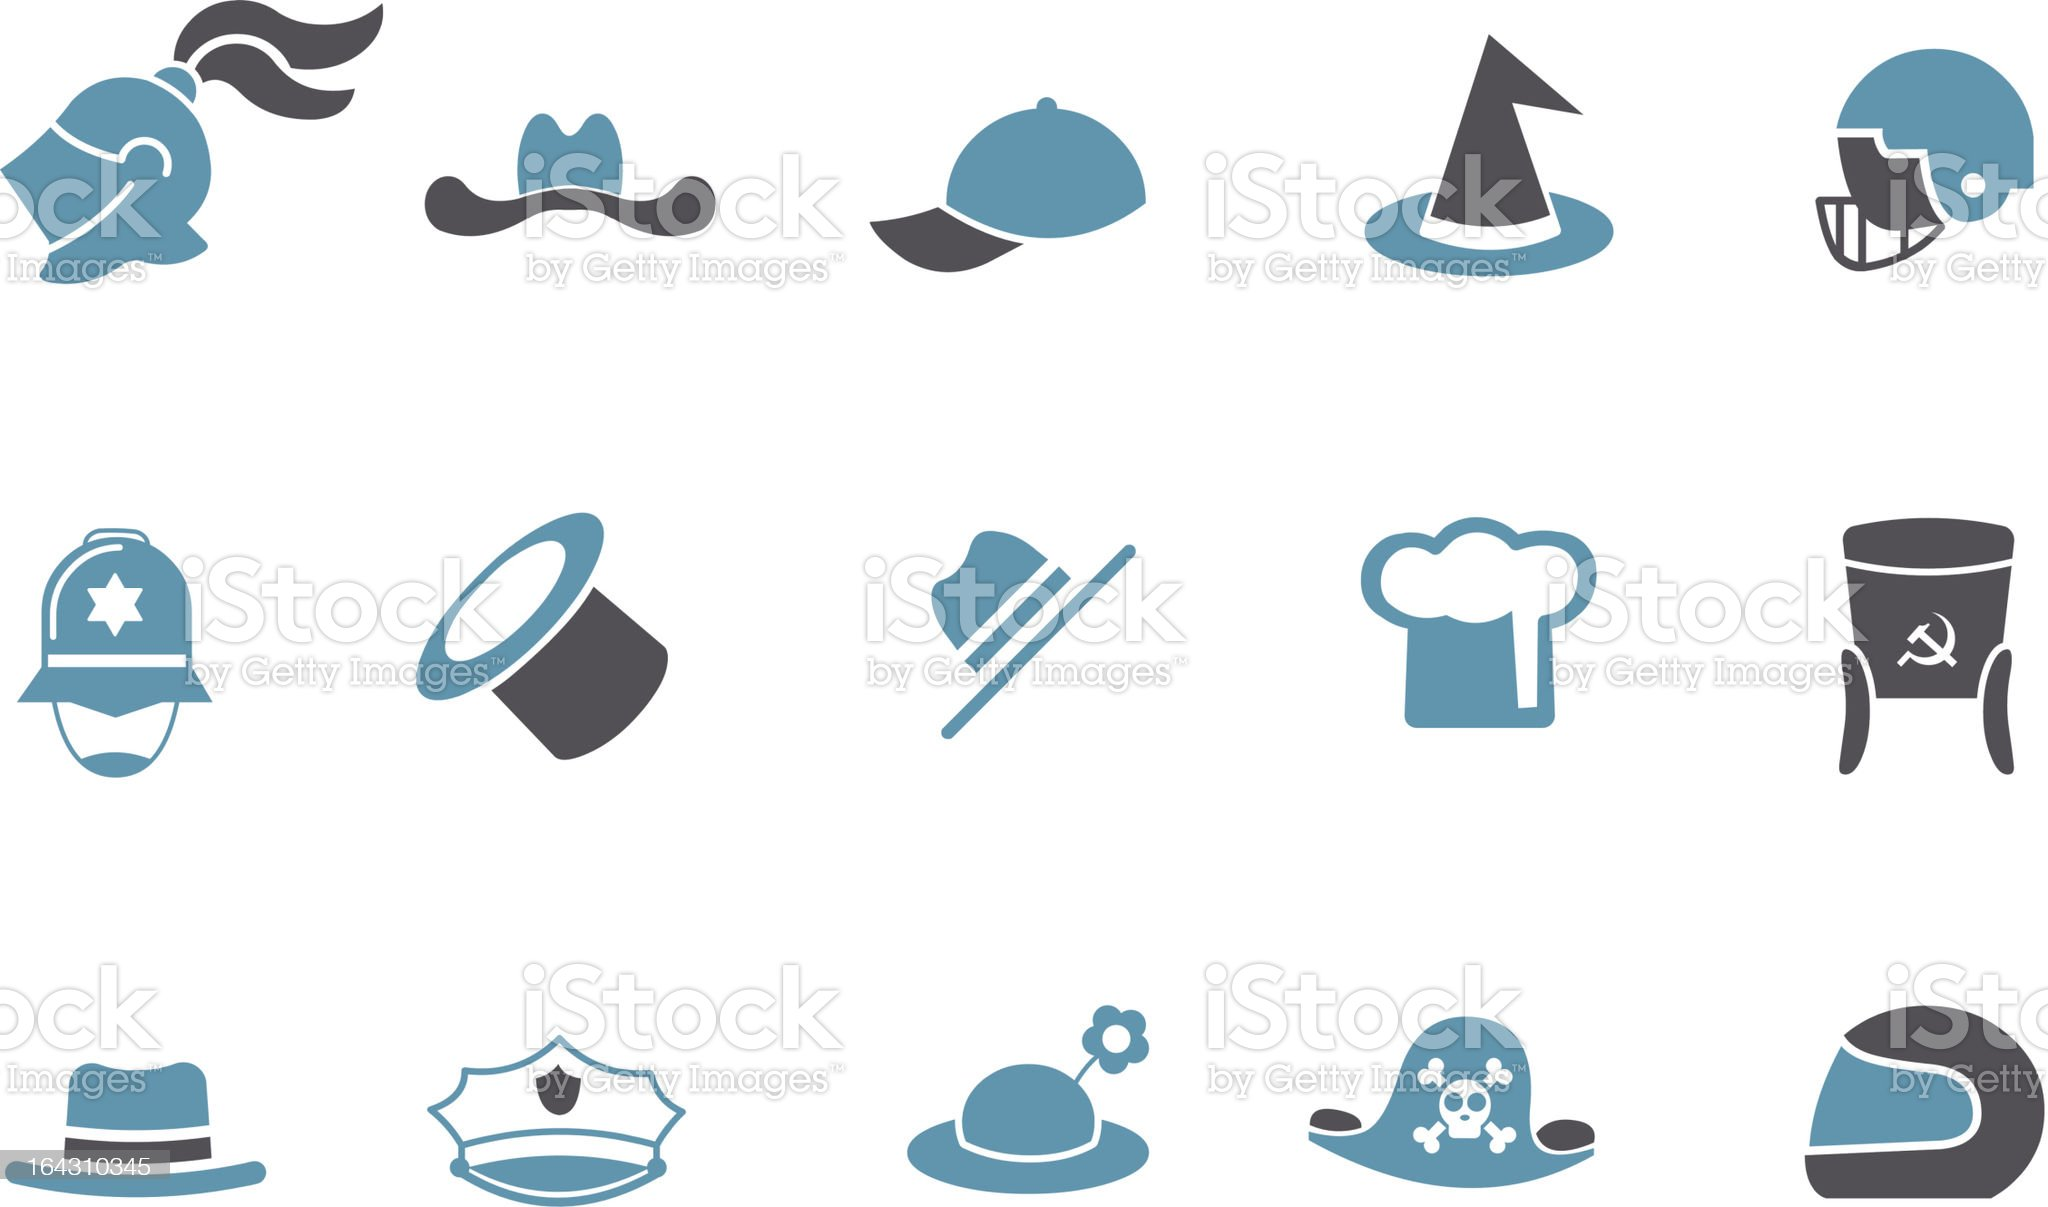 Hat Icon Set royalty-free stock vector art